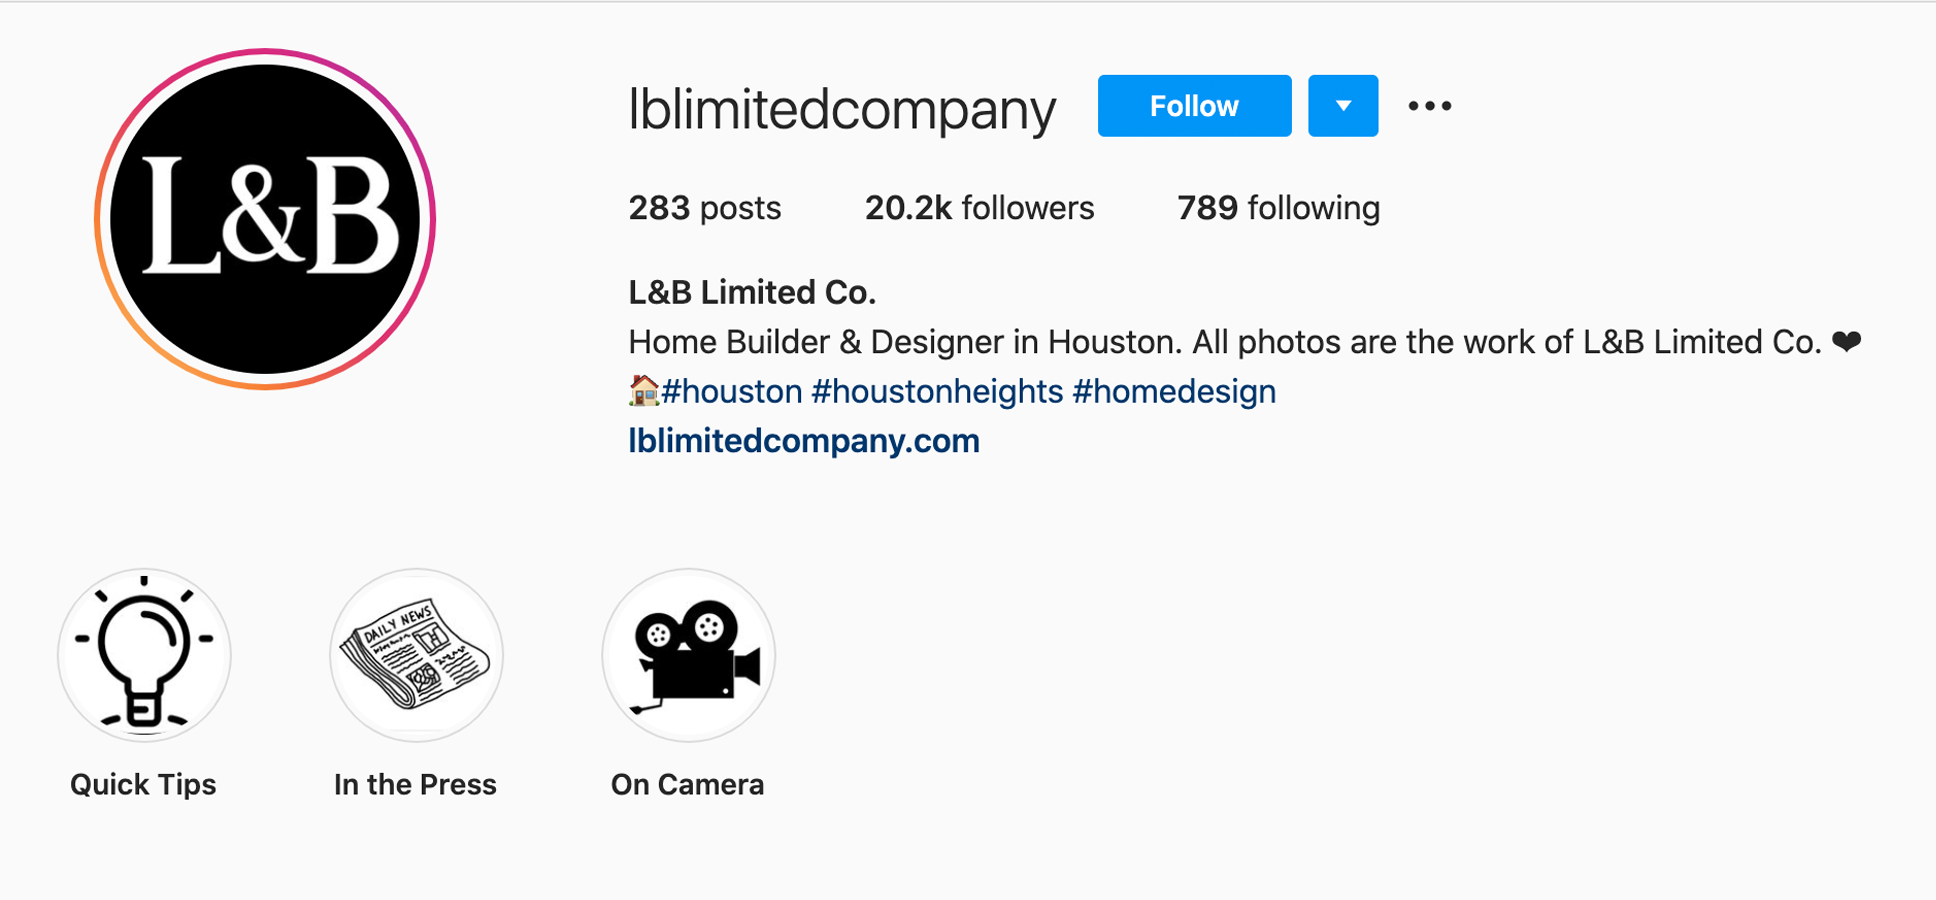 lblimitedcompany-instagram-profile